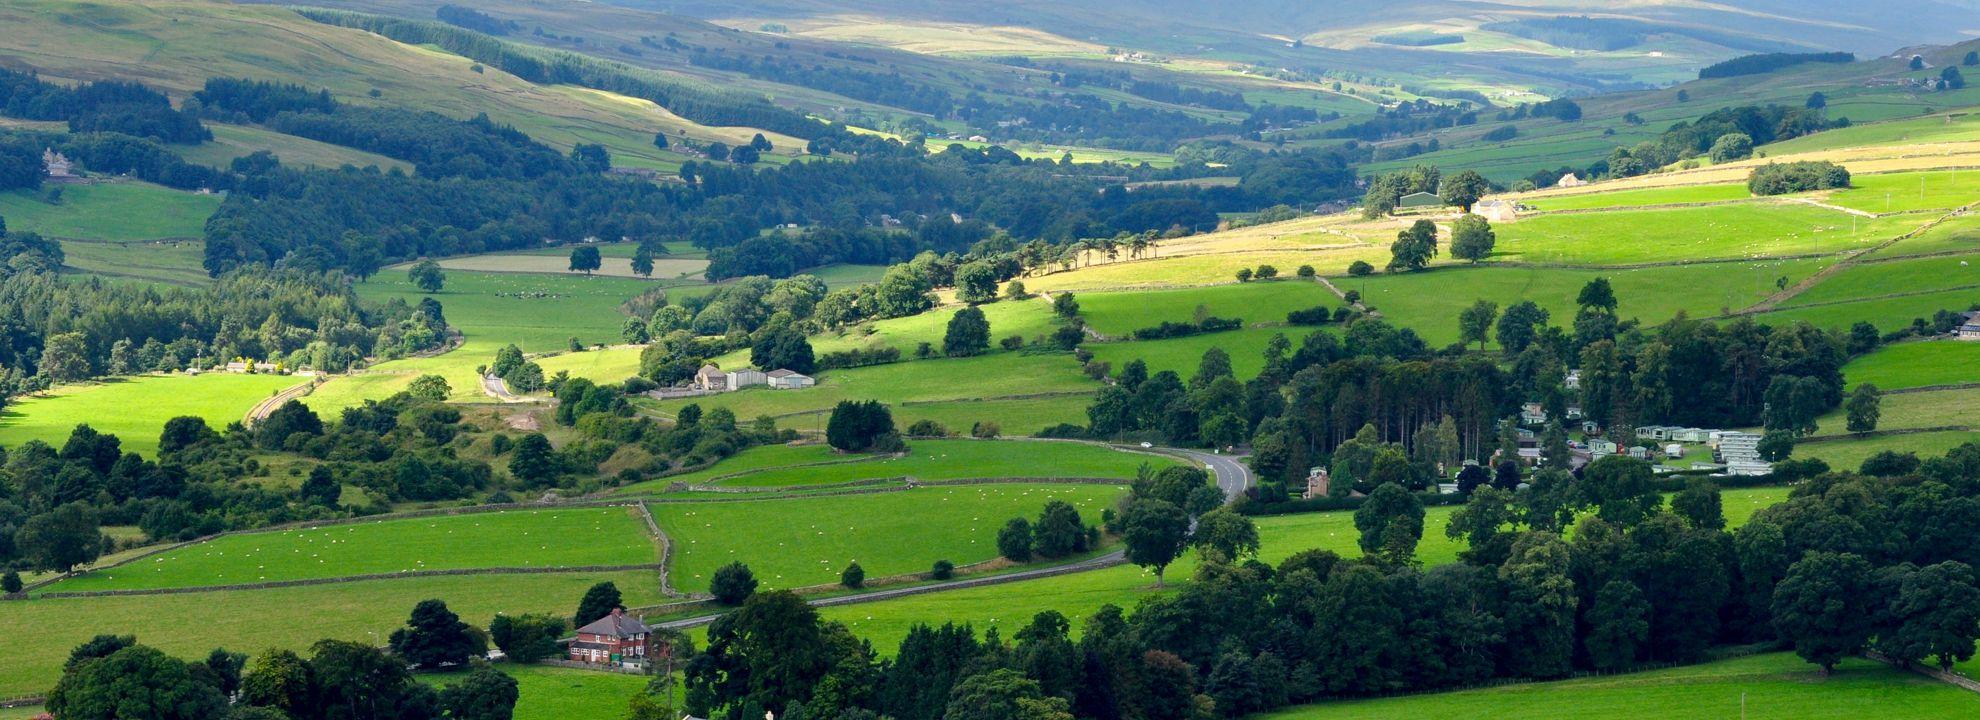 Weardale hills, County Durham